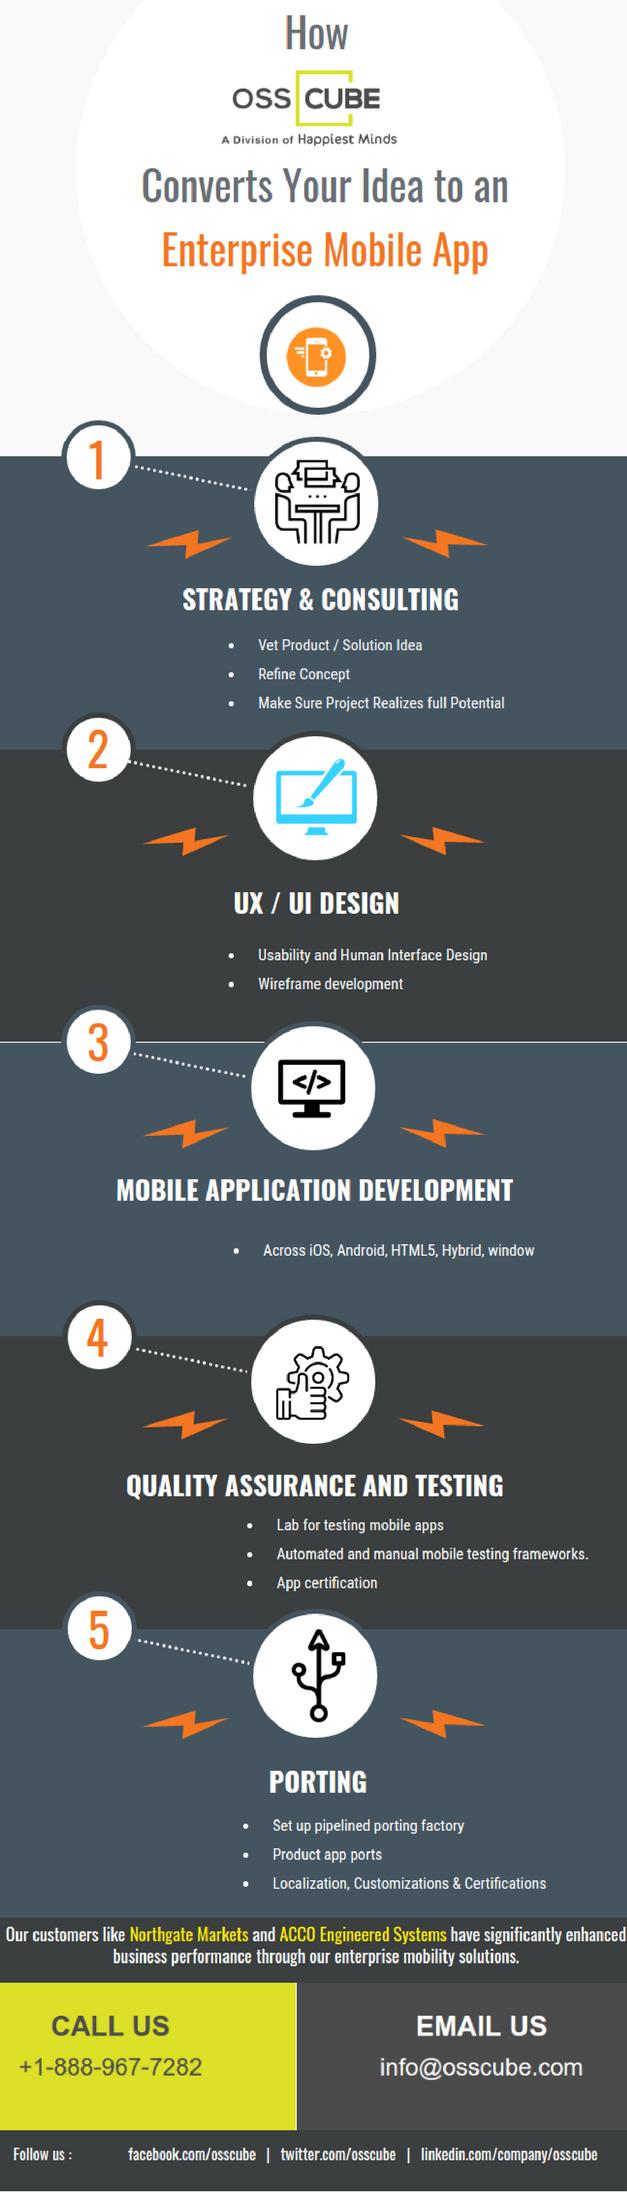 /how-osscube-converts-your-idea-to-an-enterprise-mobile-app-3a8fa5e4d5c9 feature image